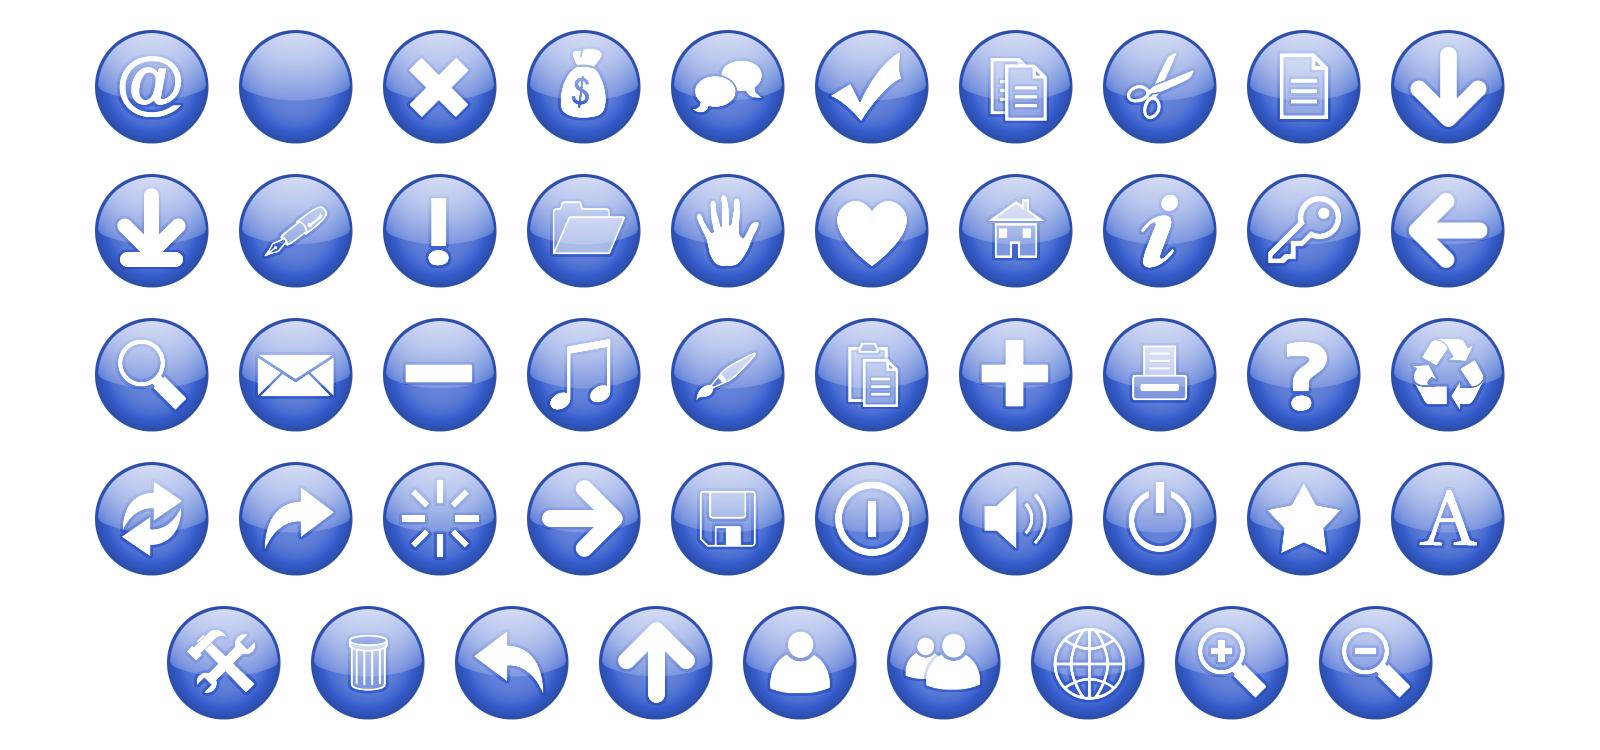 19 free icons 1 images free 32x32 icons free icon